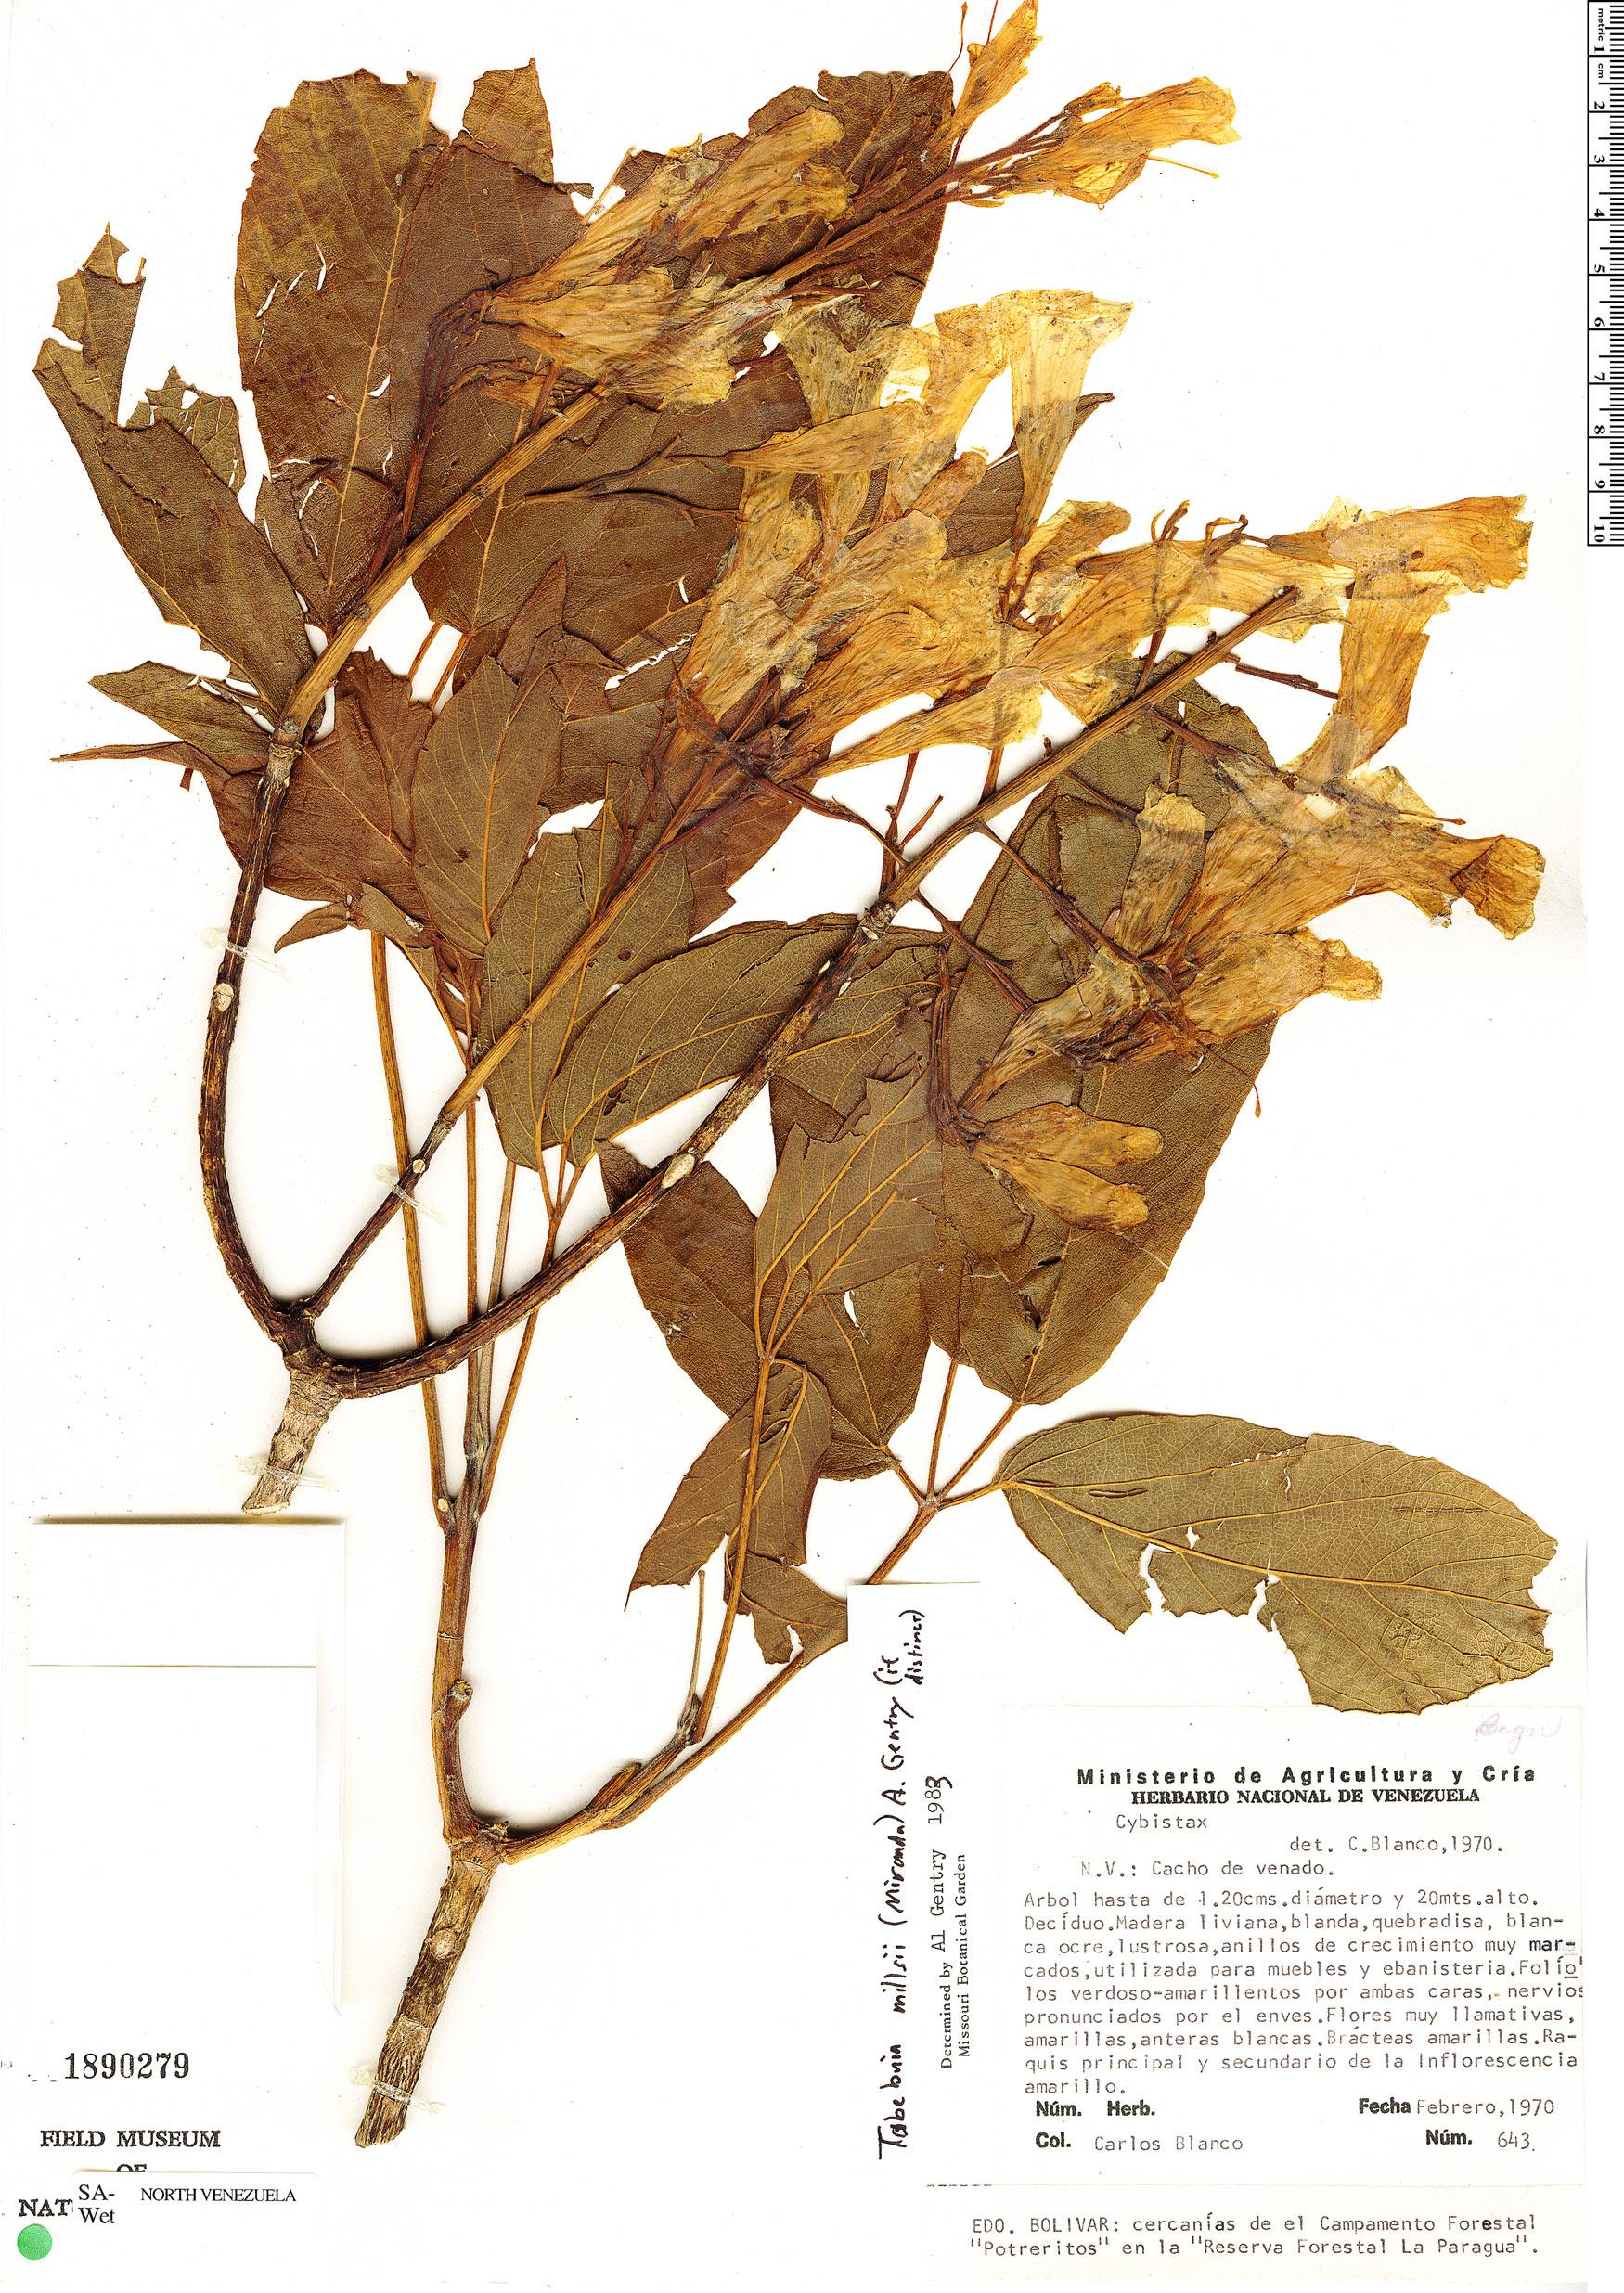 Specimen: Roseodendron donnell-smithii